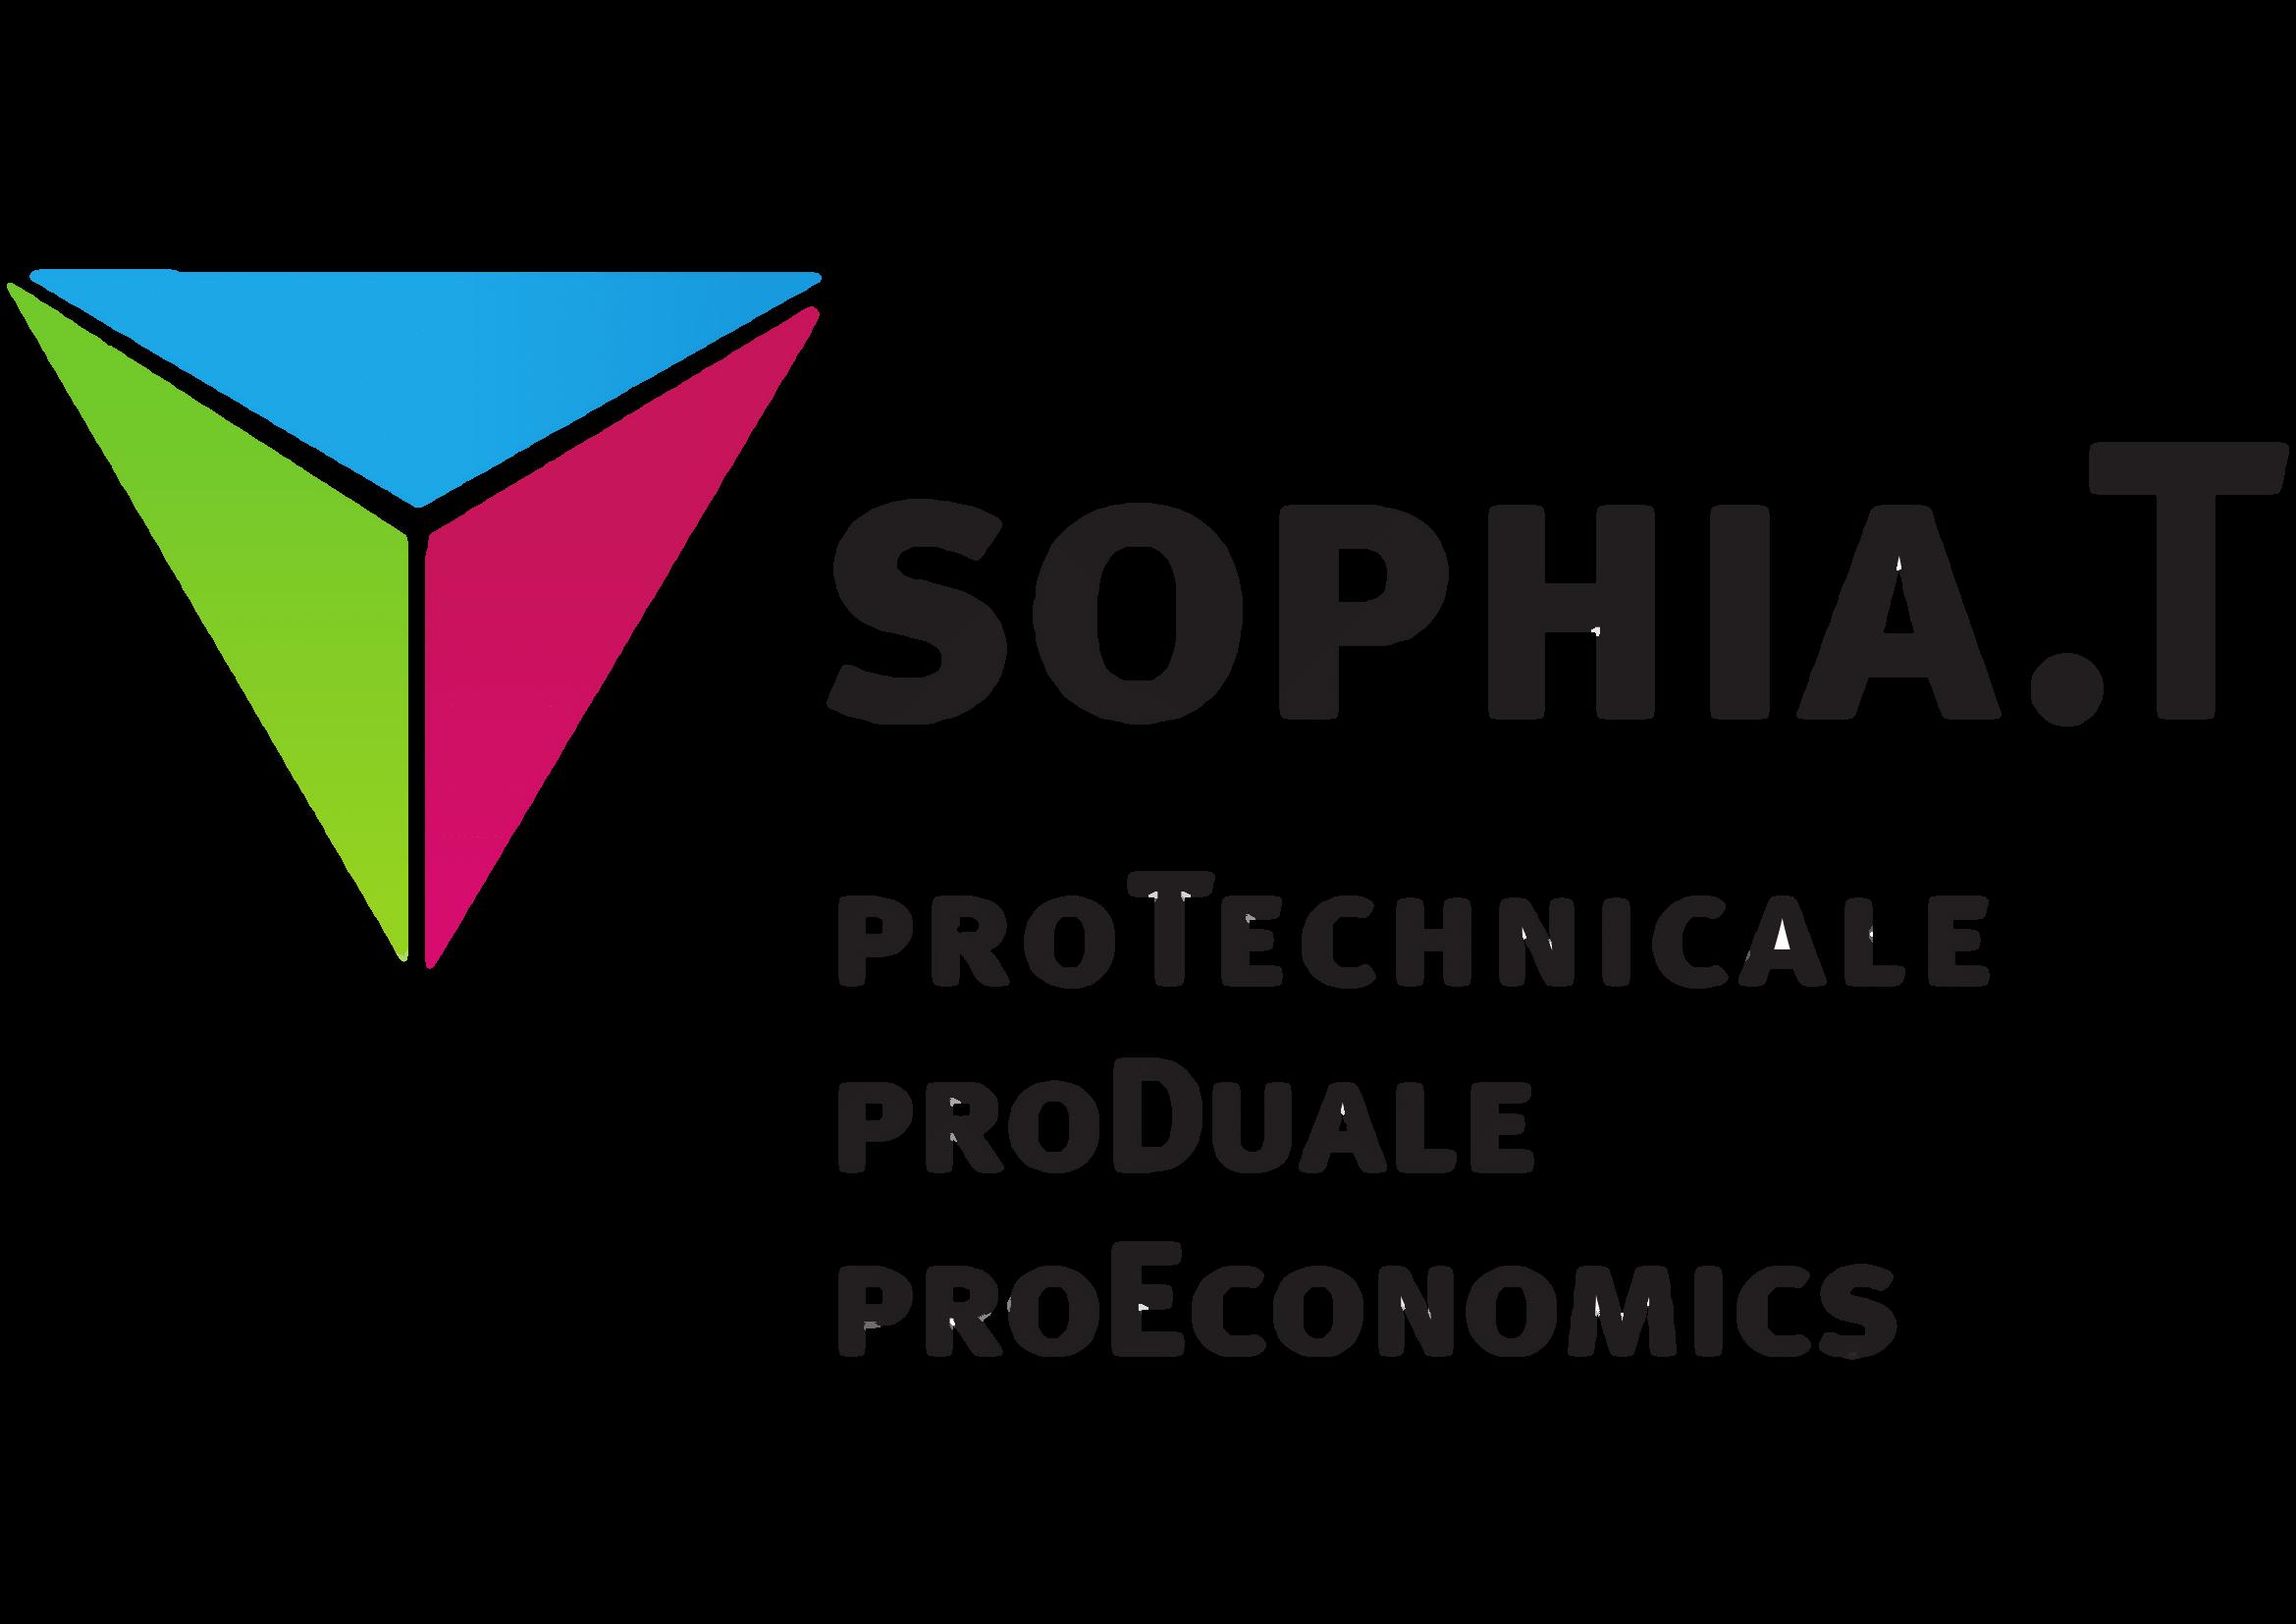 proTechnicale; proEconomics